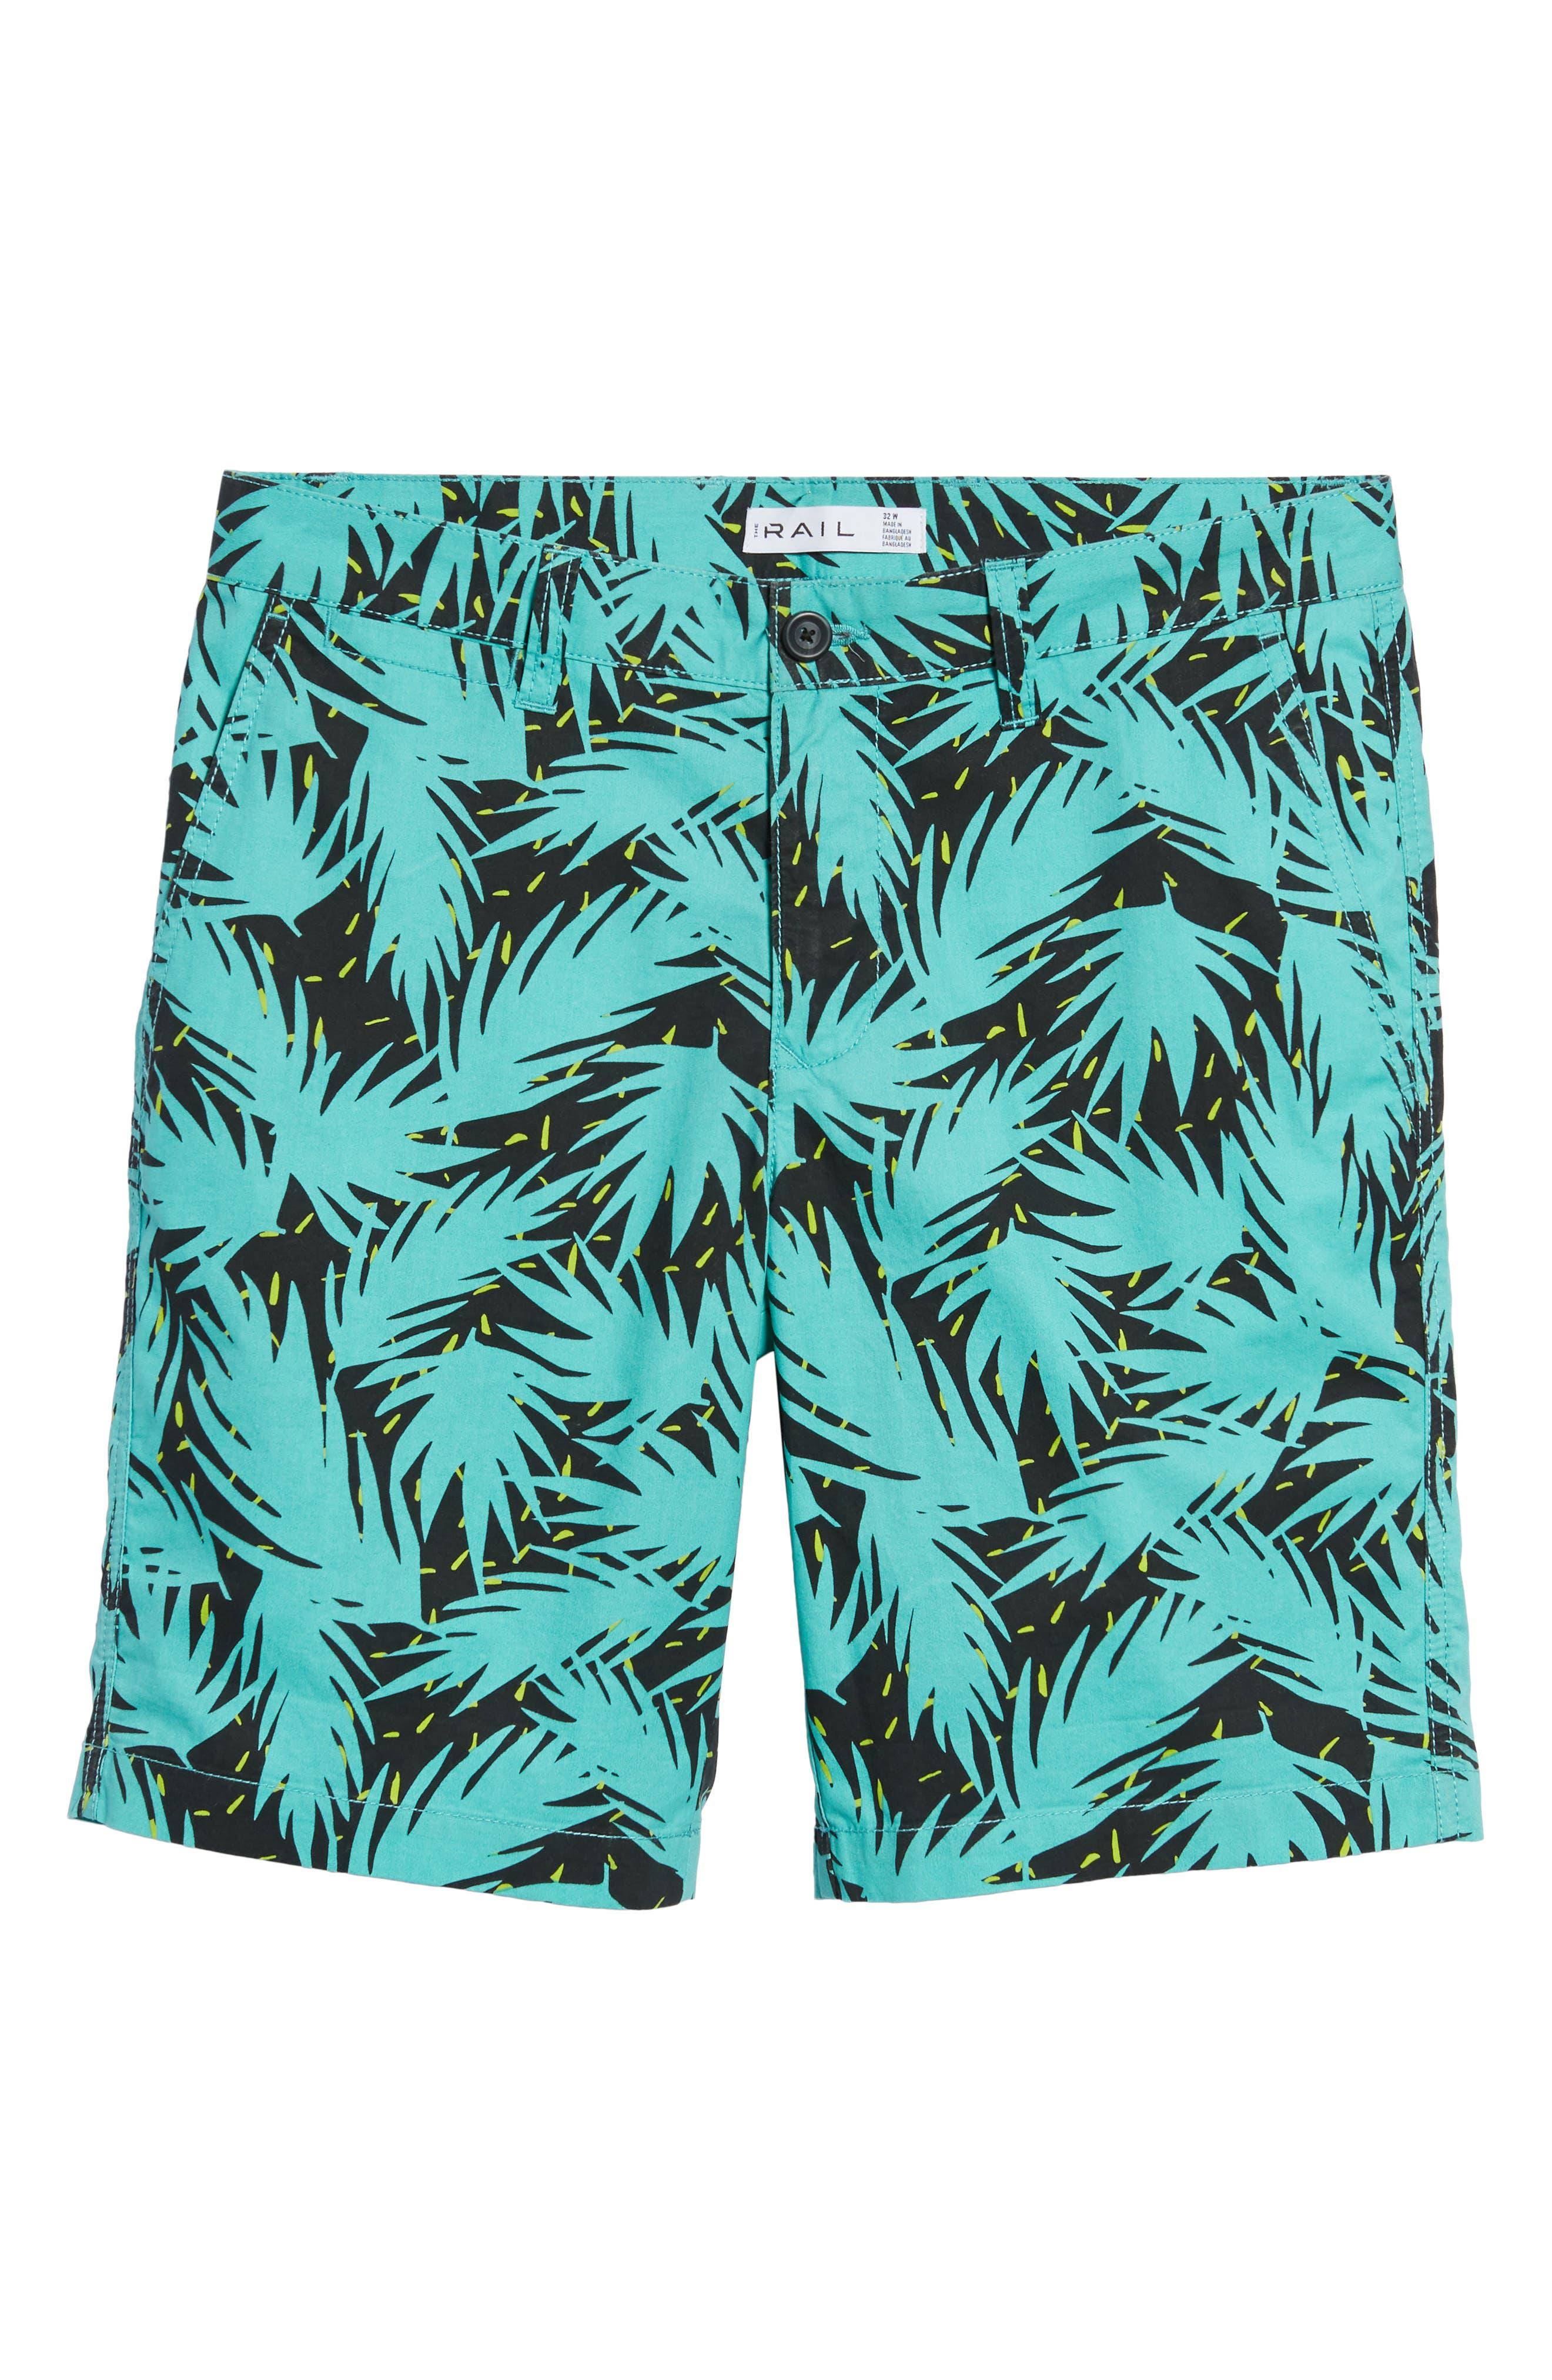 Neo Tropical Shorts,                             Alternate thumbnail 6, color,                             440